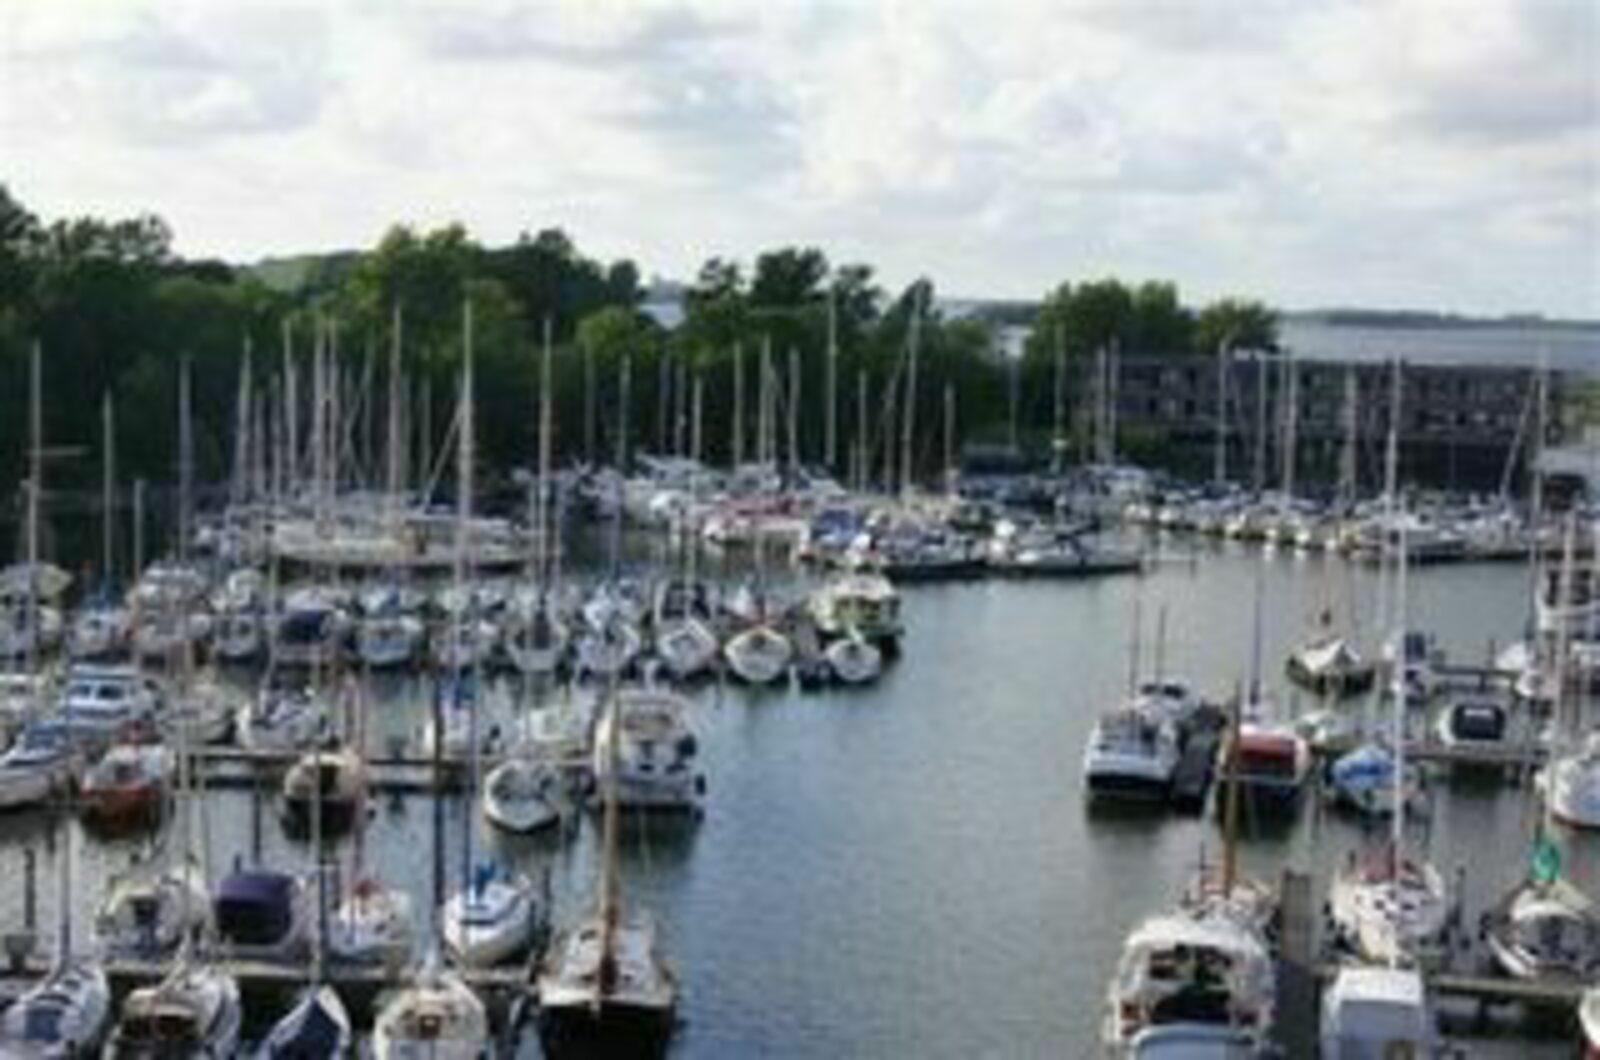 Ferienappartement - Muidenweg 1P | Arnemuiden